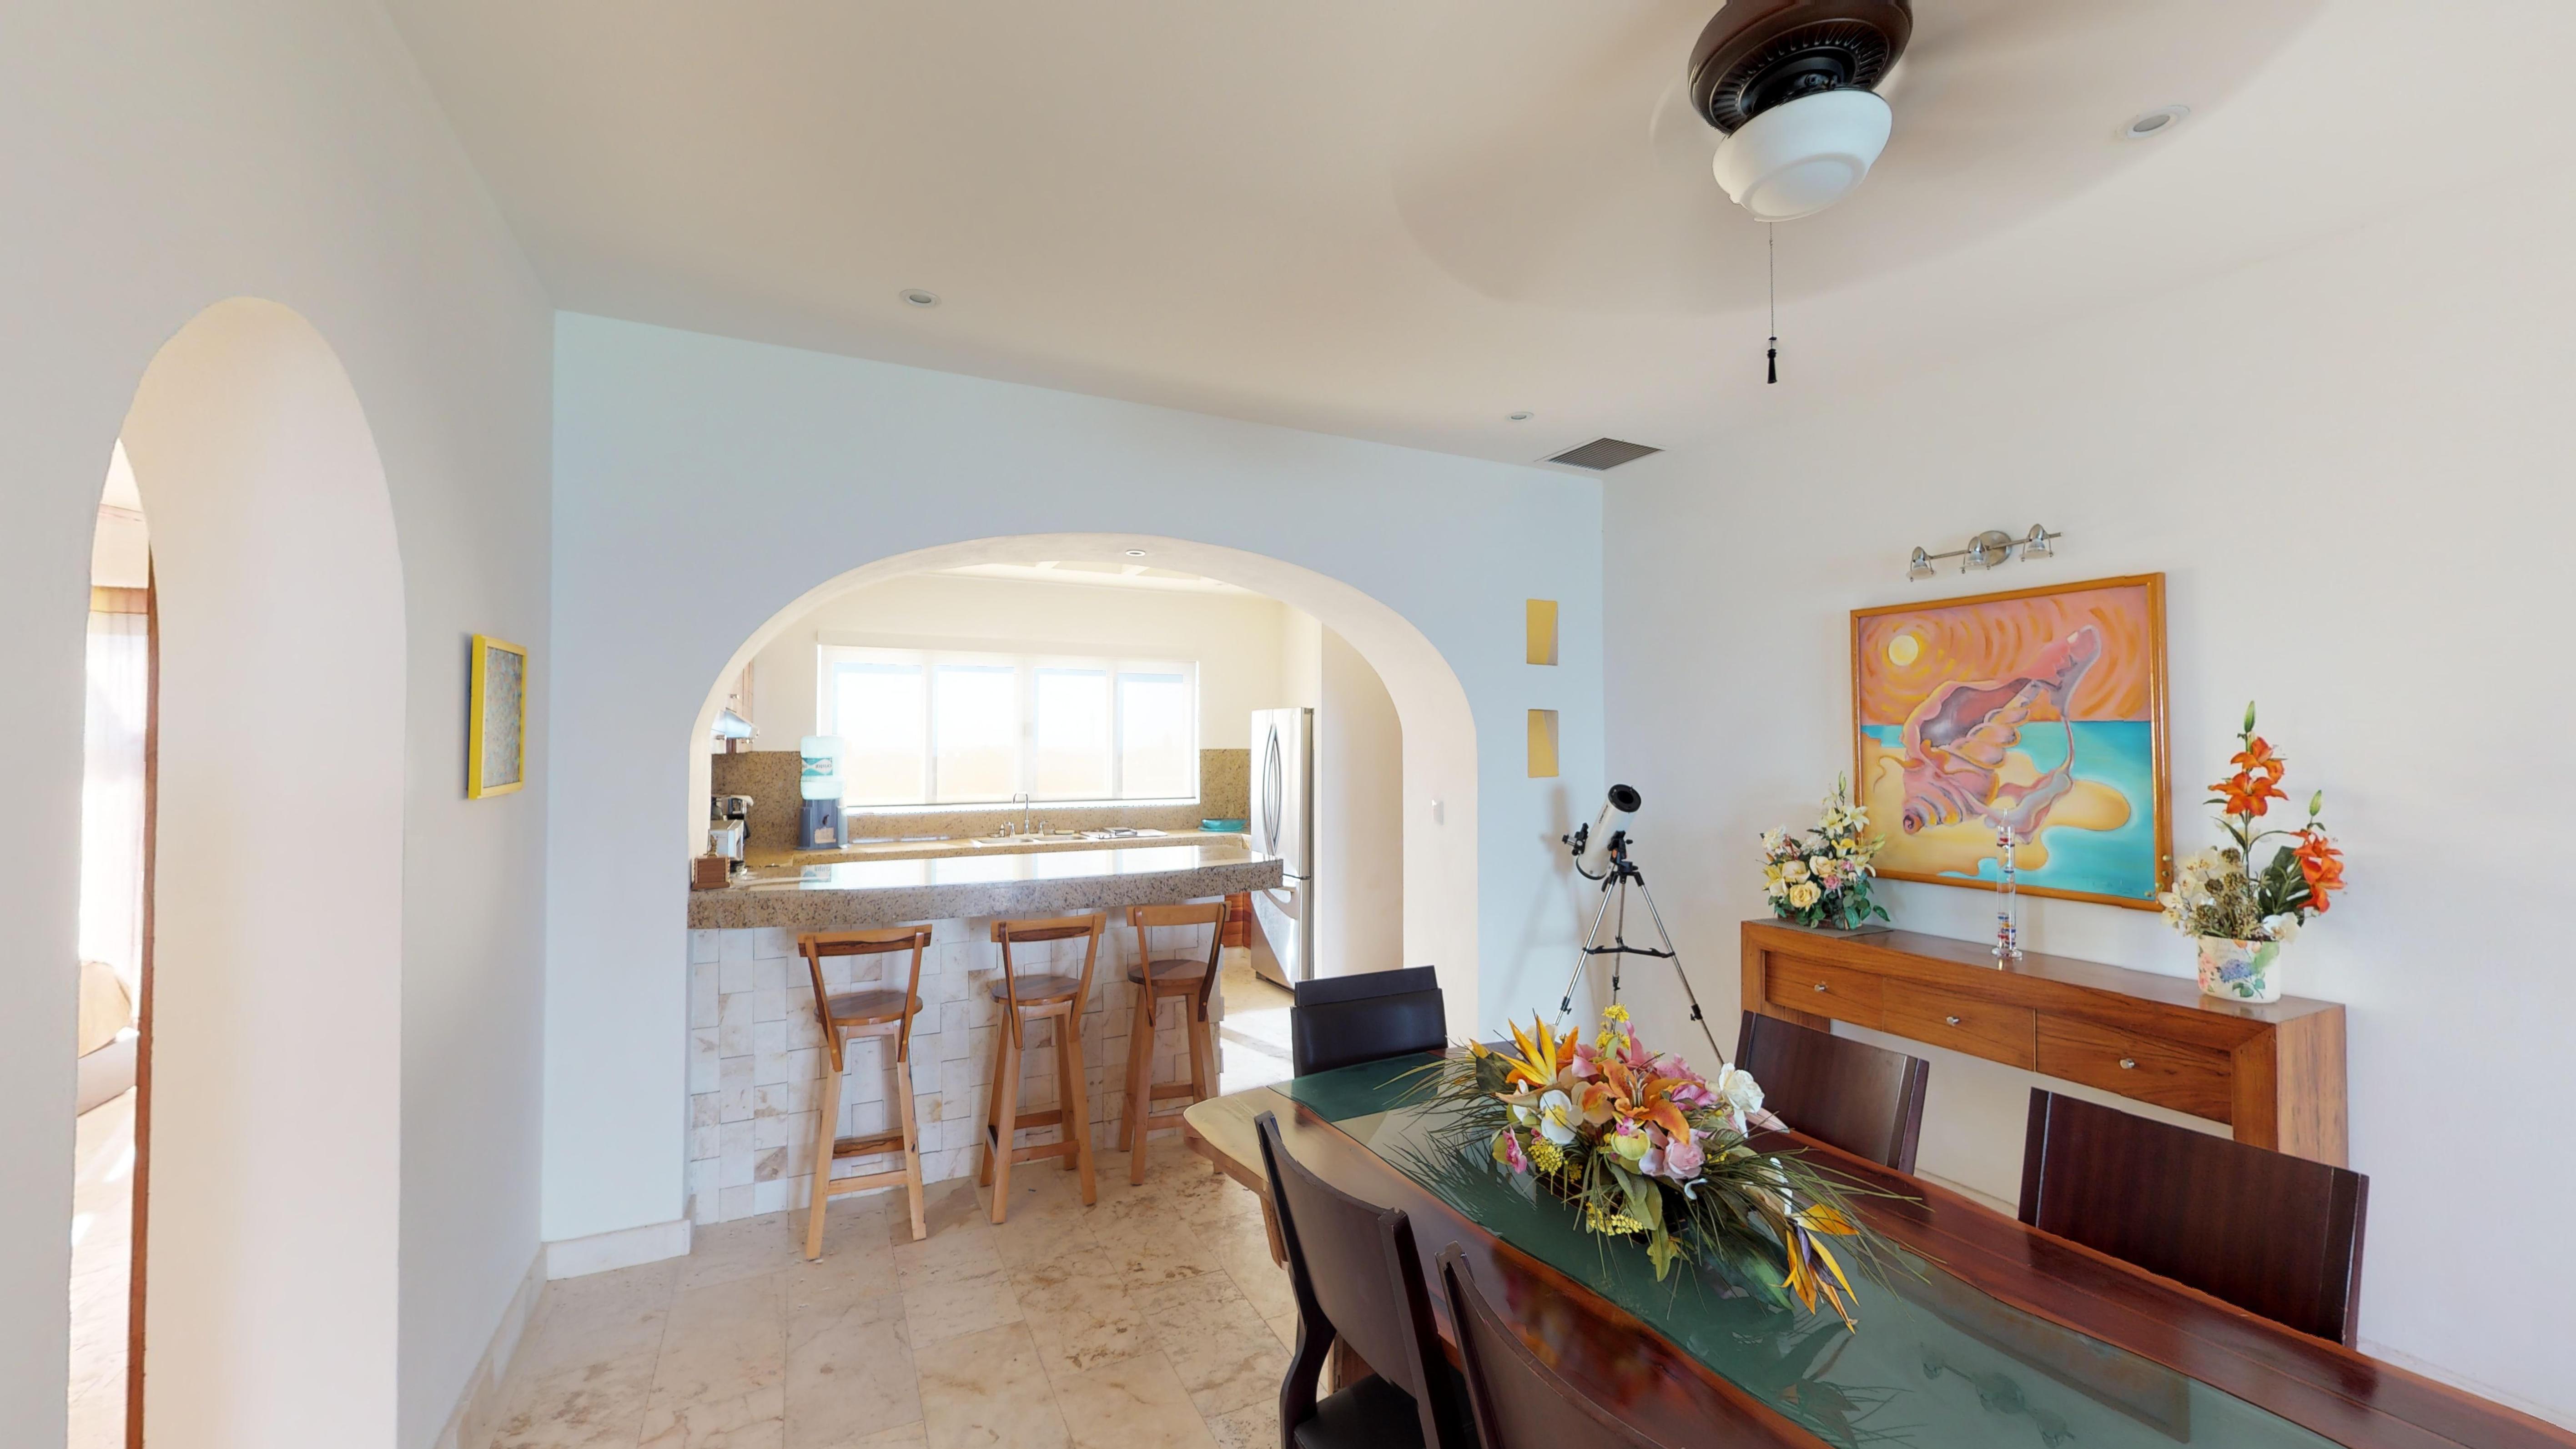 Isla-33-Apartament-1201-dinningkitchen.j